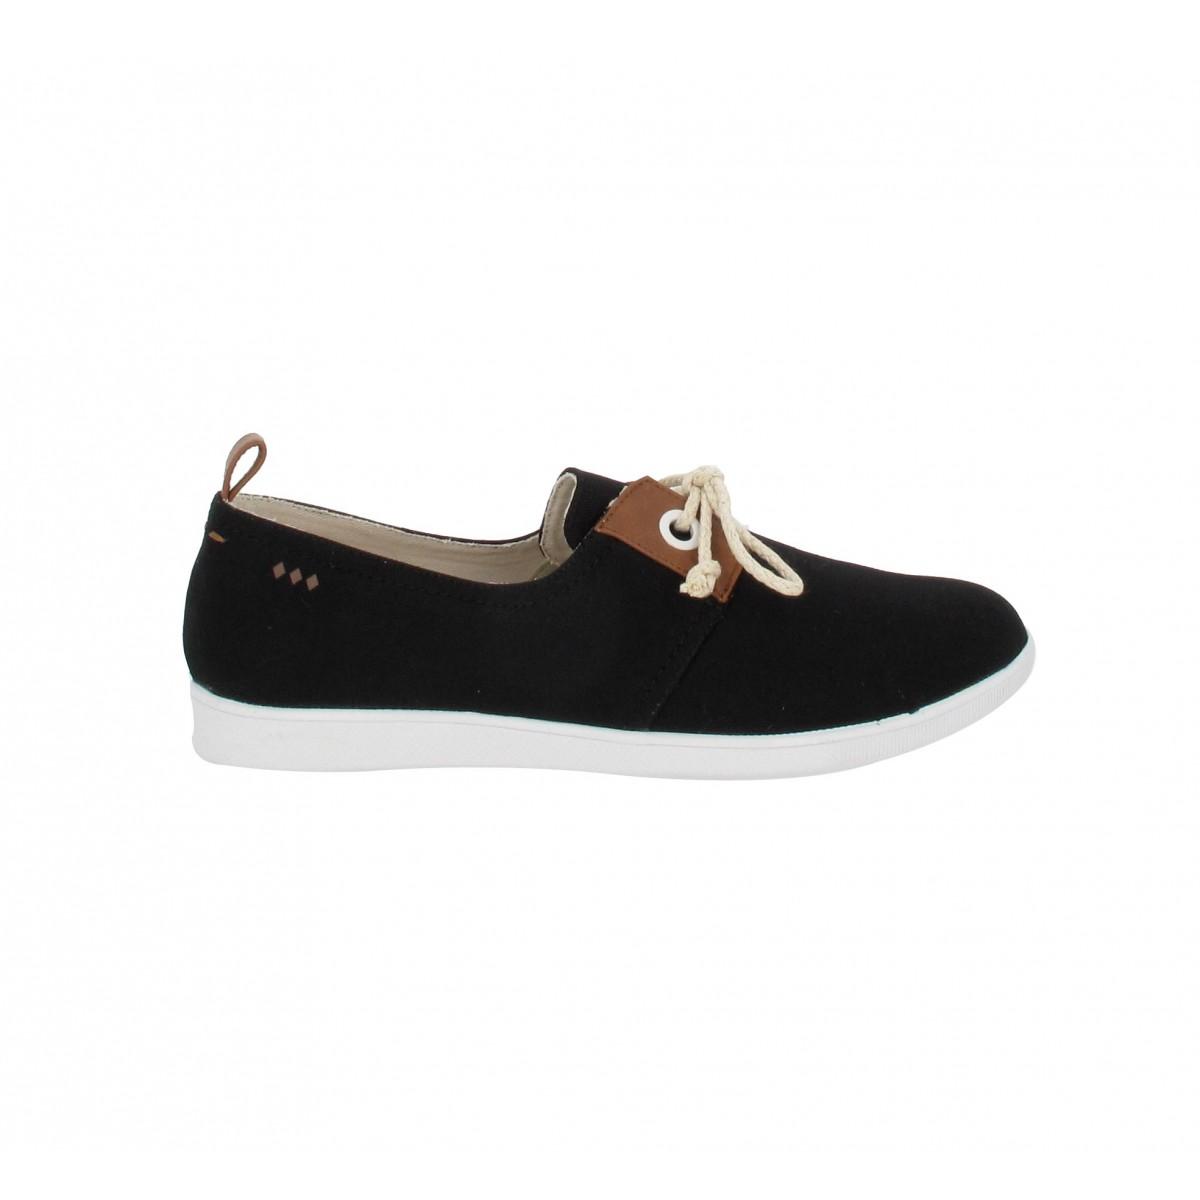 soldes armistice stone 1 toile femme noir fanny chaussures. Black Bedroom Furniture Sets. Home Design Ideas